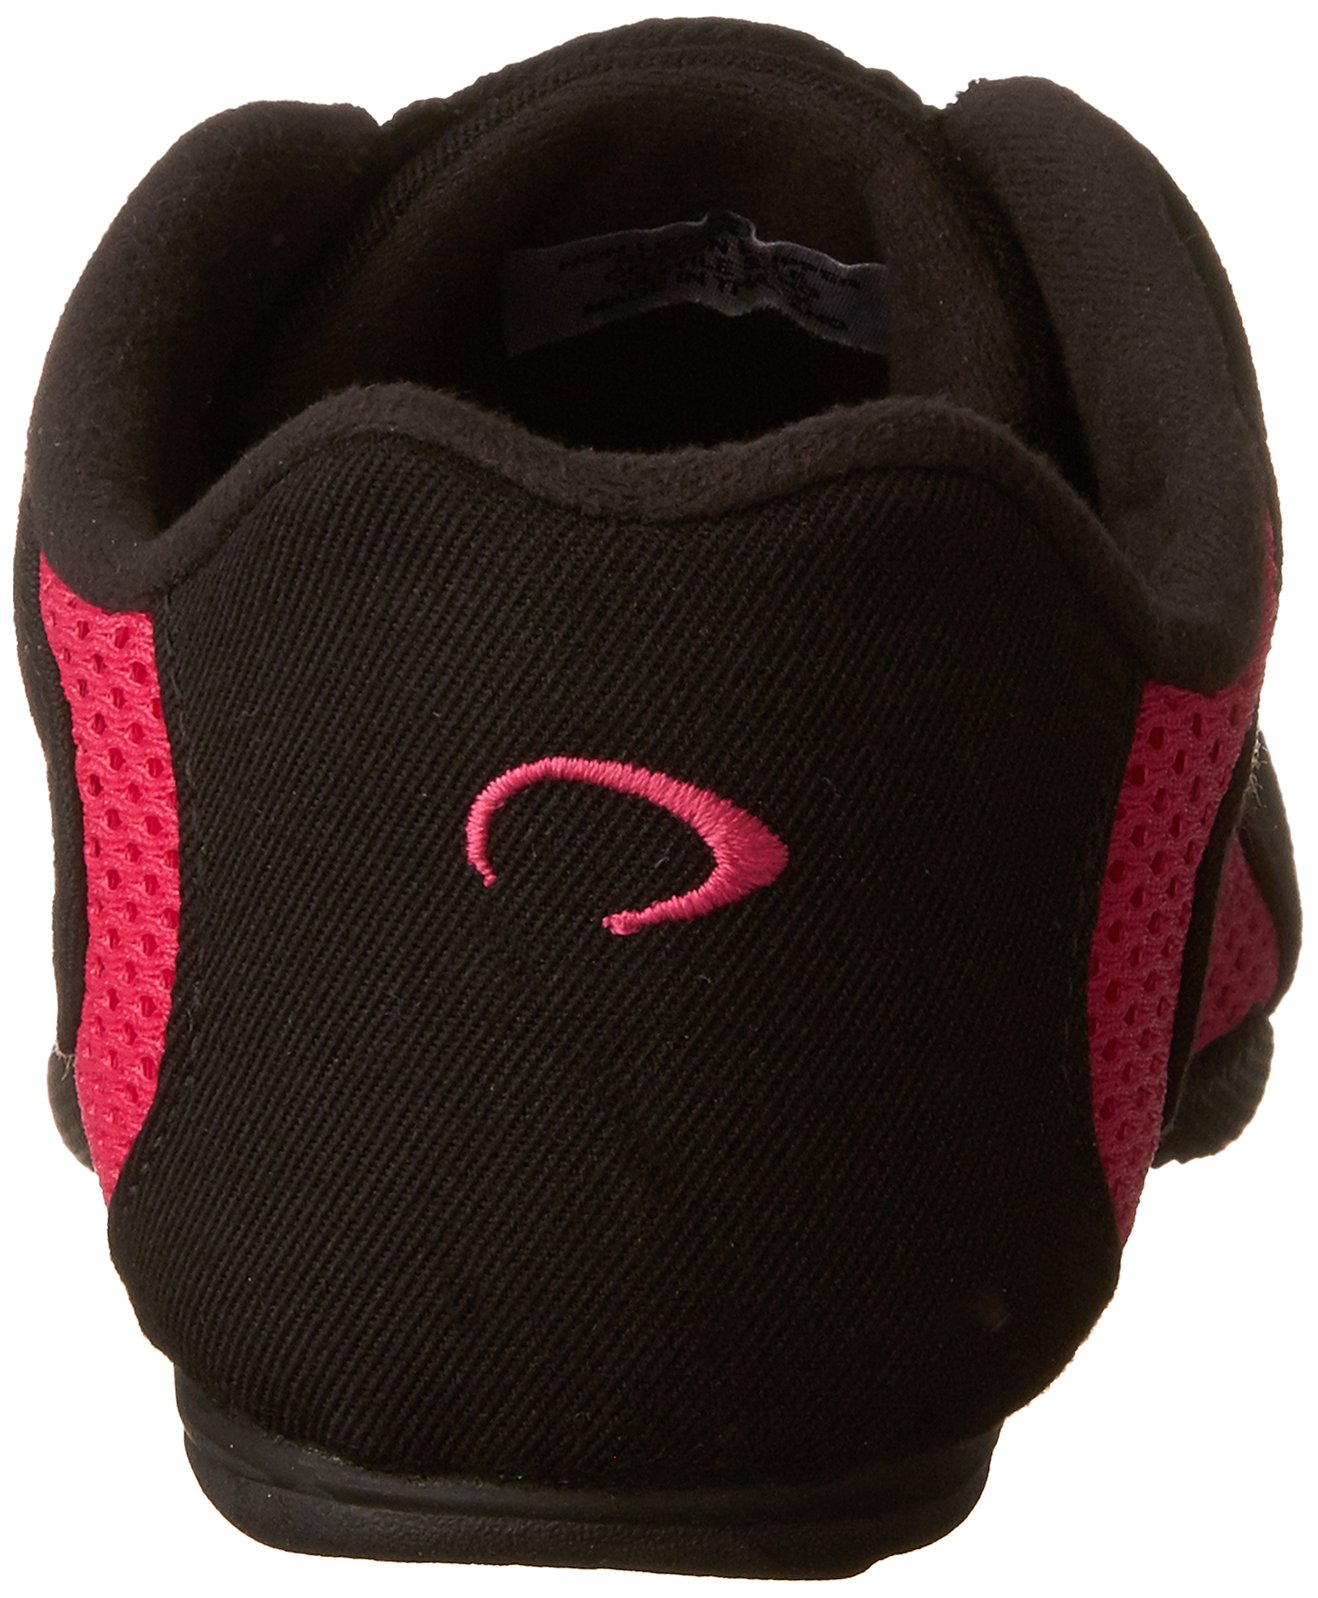 Bloch Dance Women's Amalgam Canvas Dance Sneaker, Hot Pink, 9.5 X(Medium) US by Bloch (Image #2)